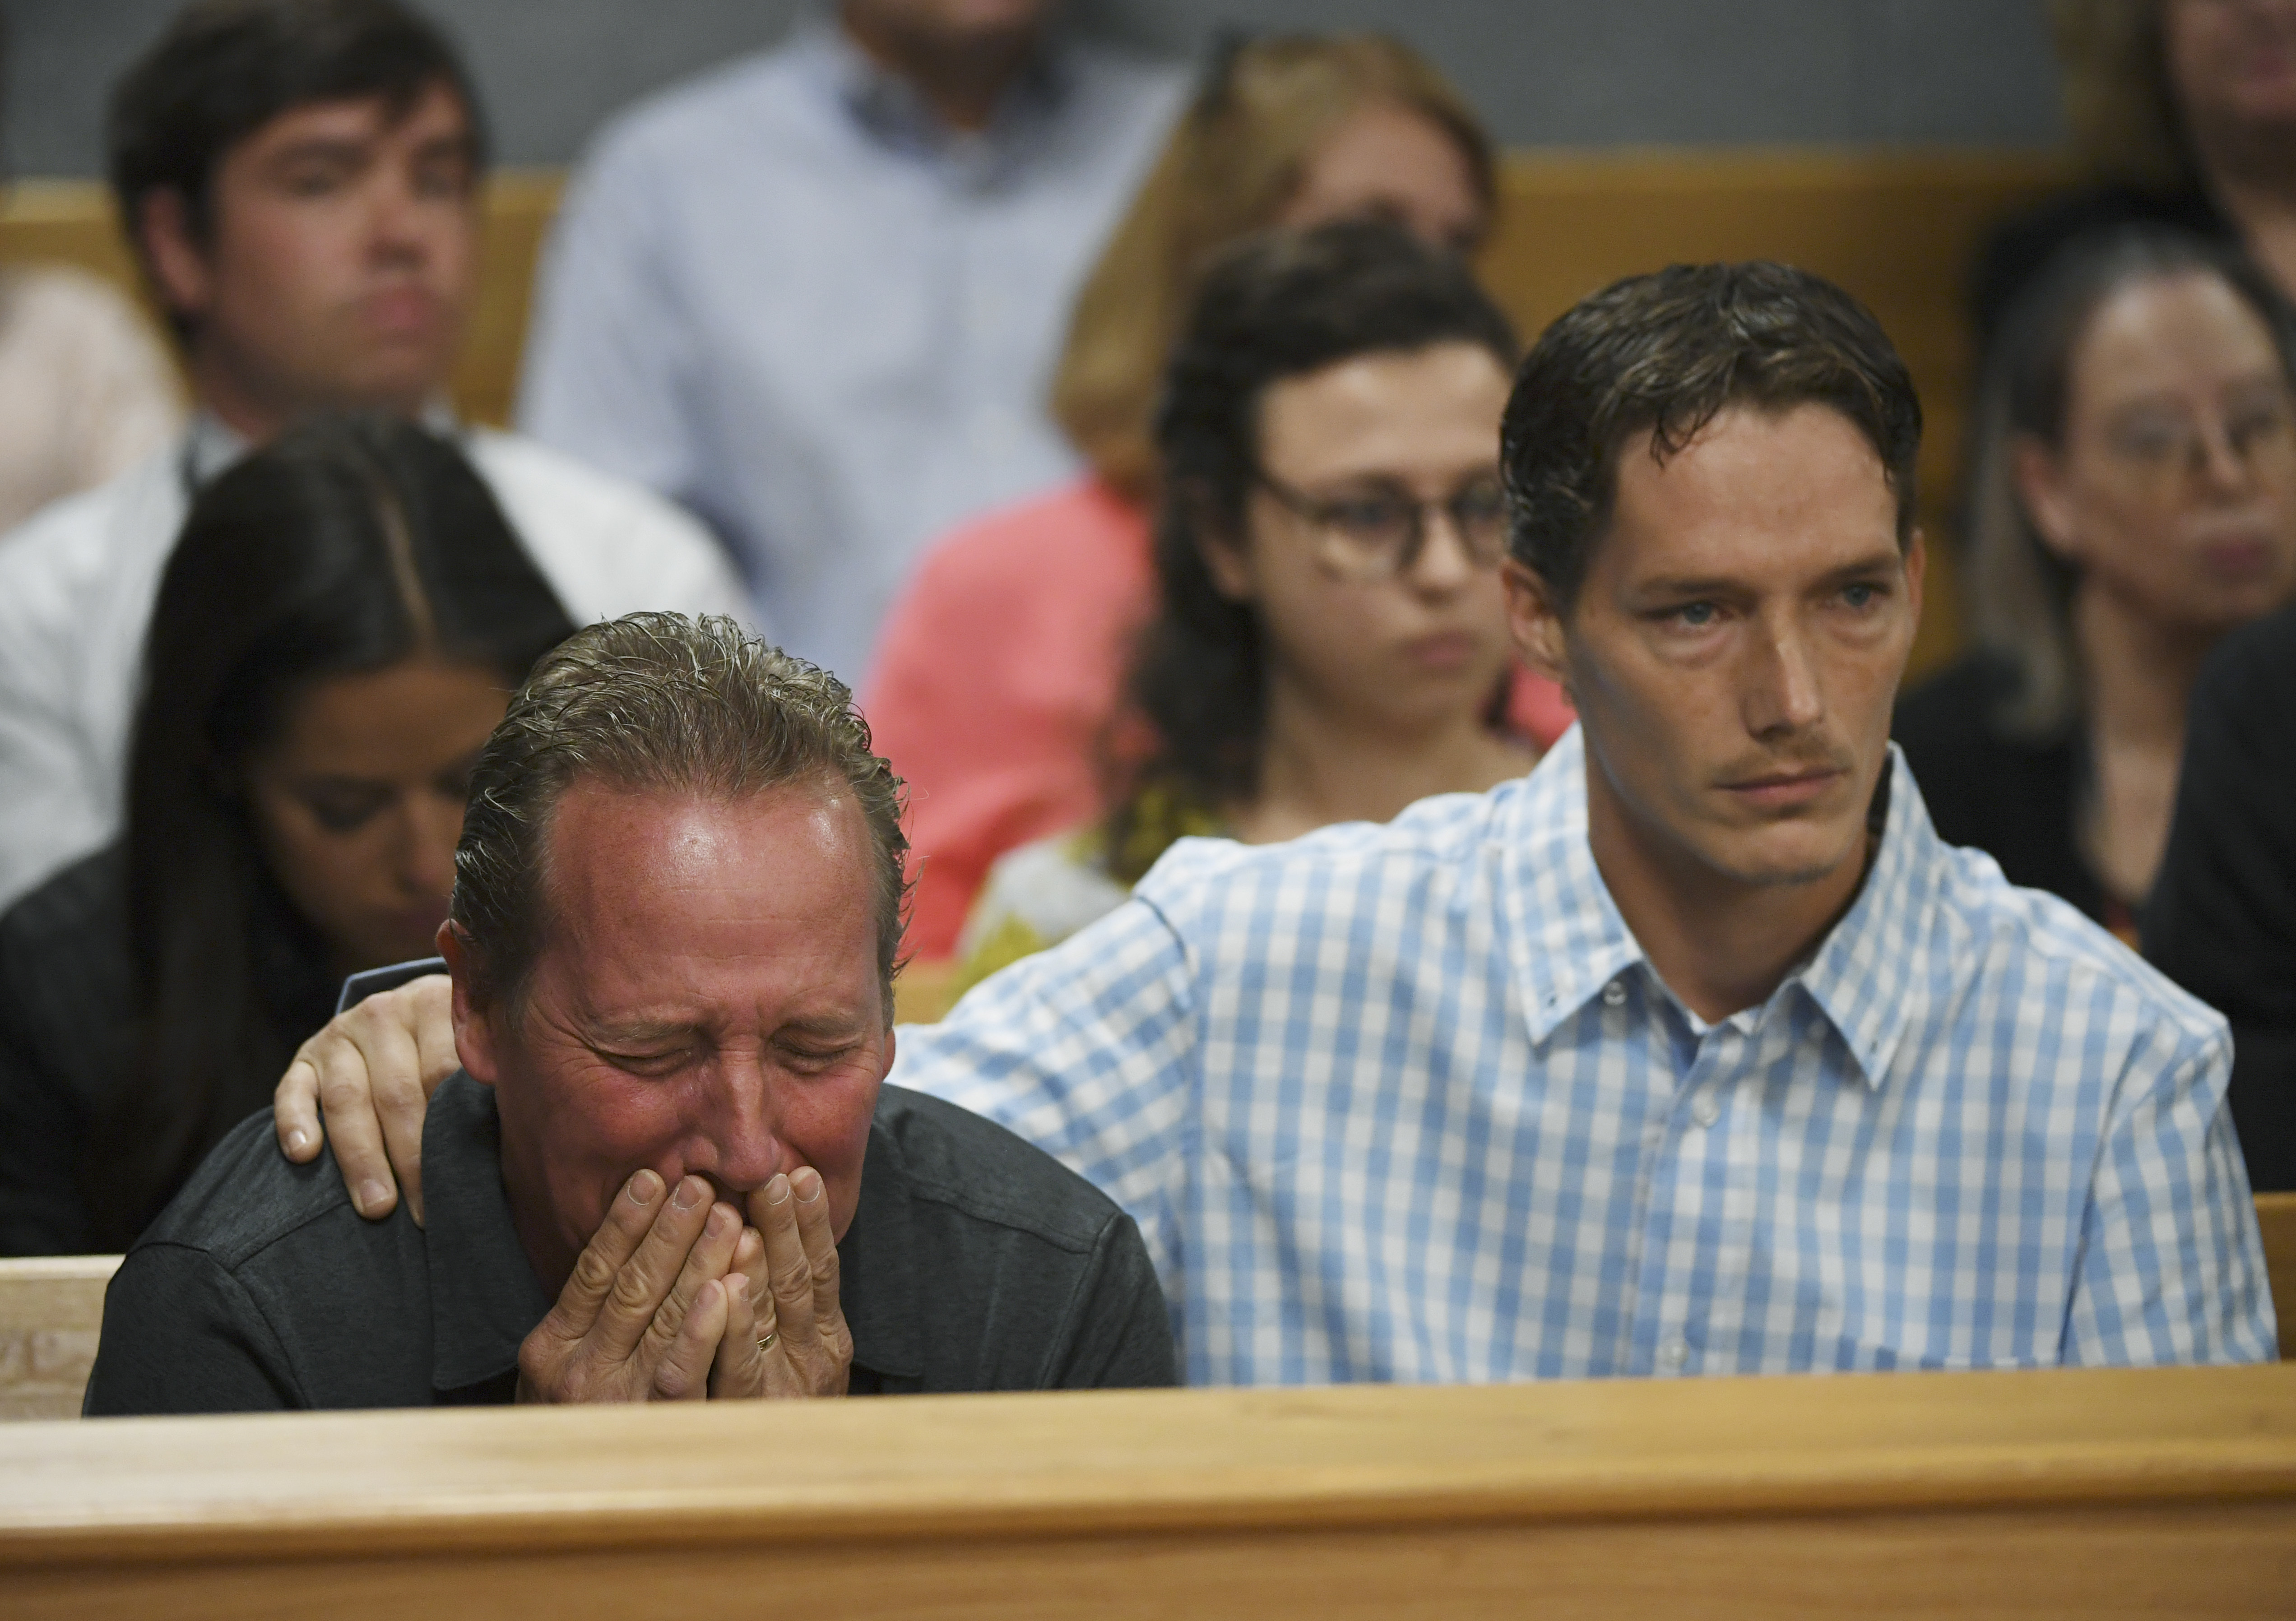 Photo: Chris Shannan Watts Murder Case 7